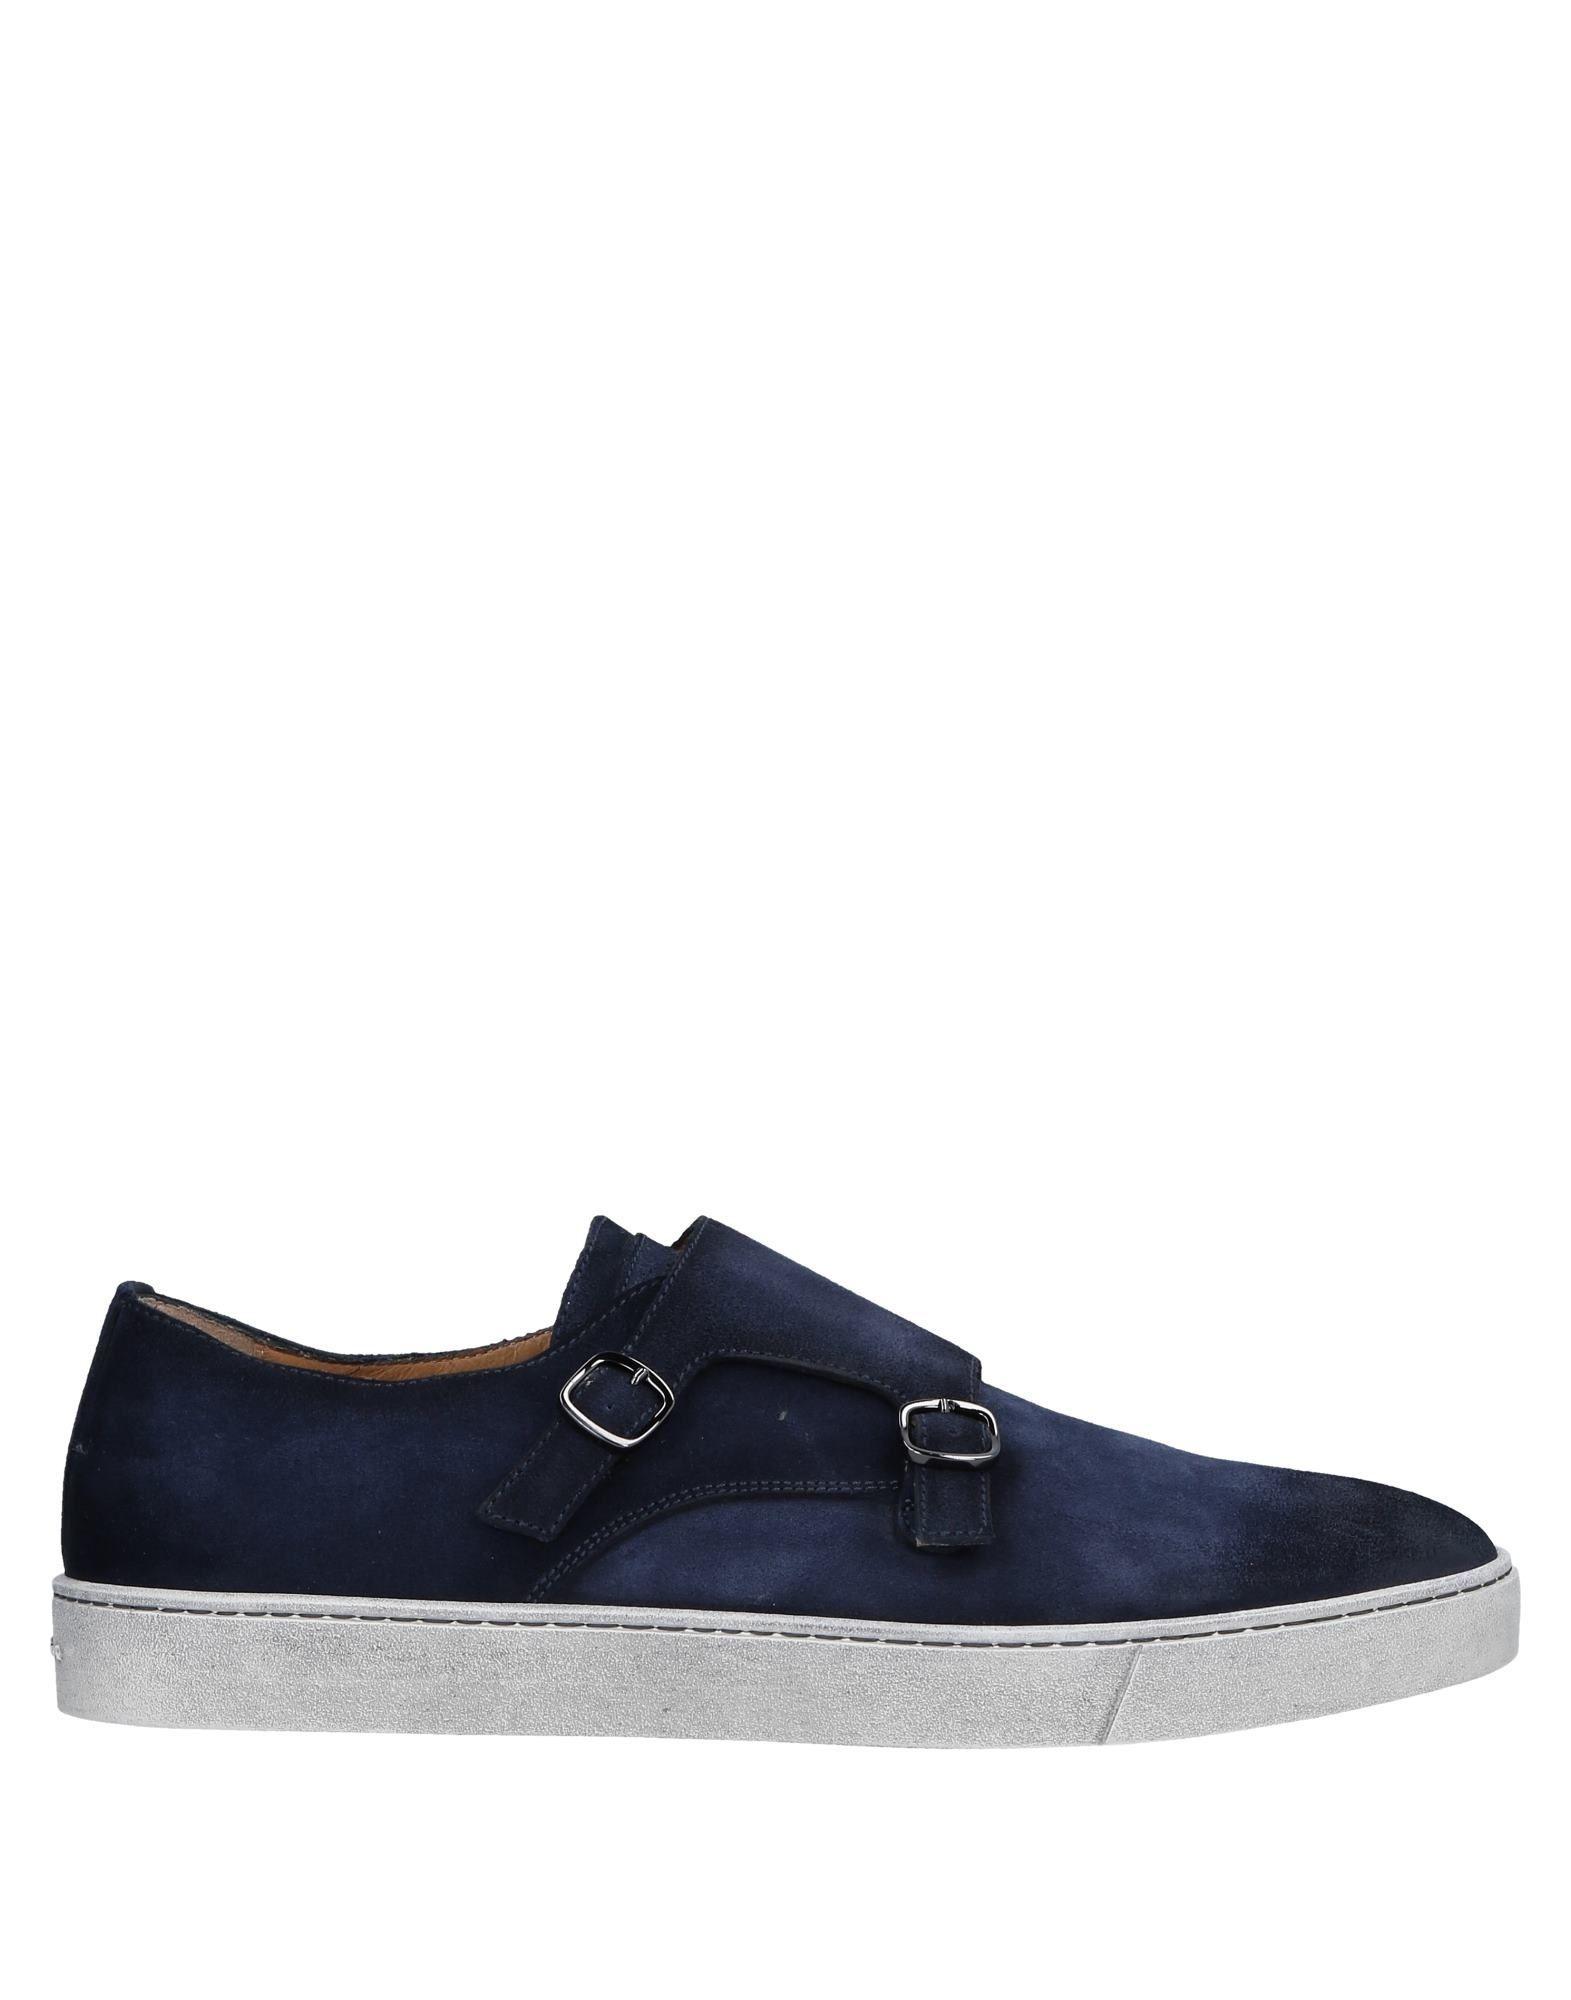 Santoni Dark Blue Leather Monkstrap